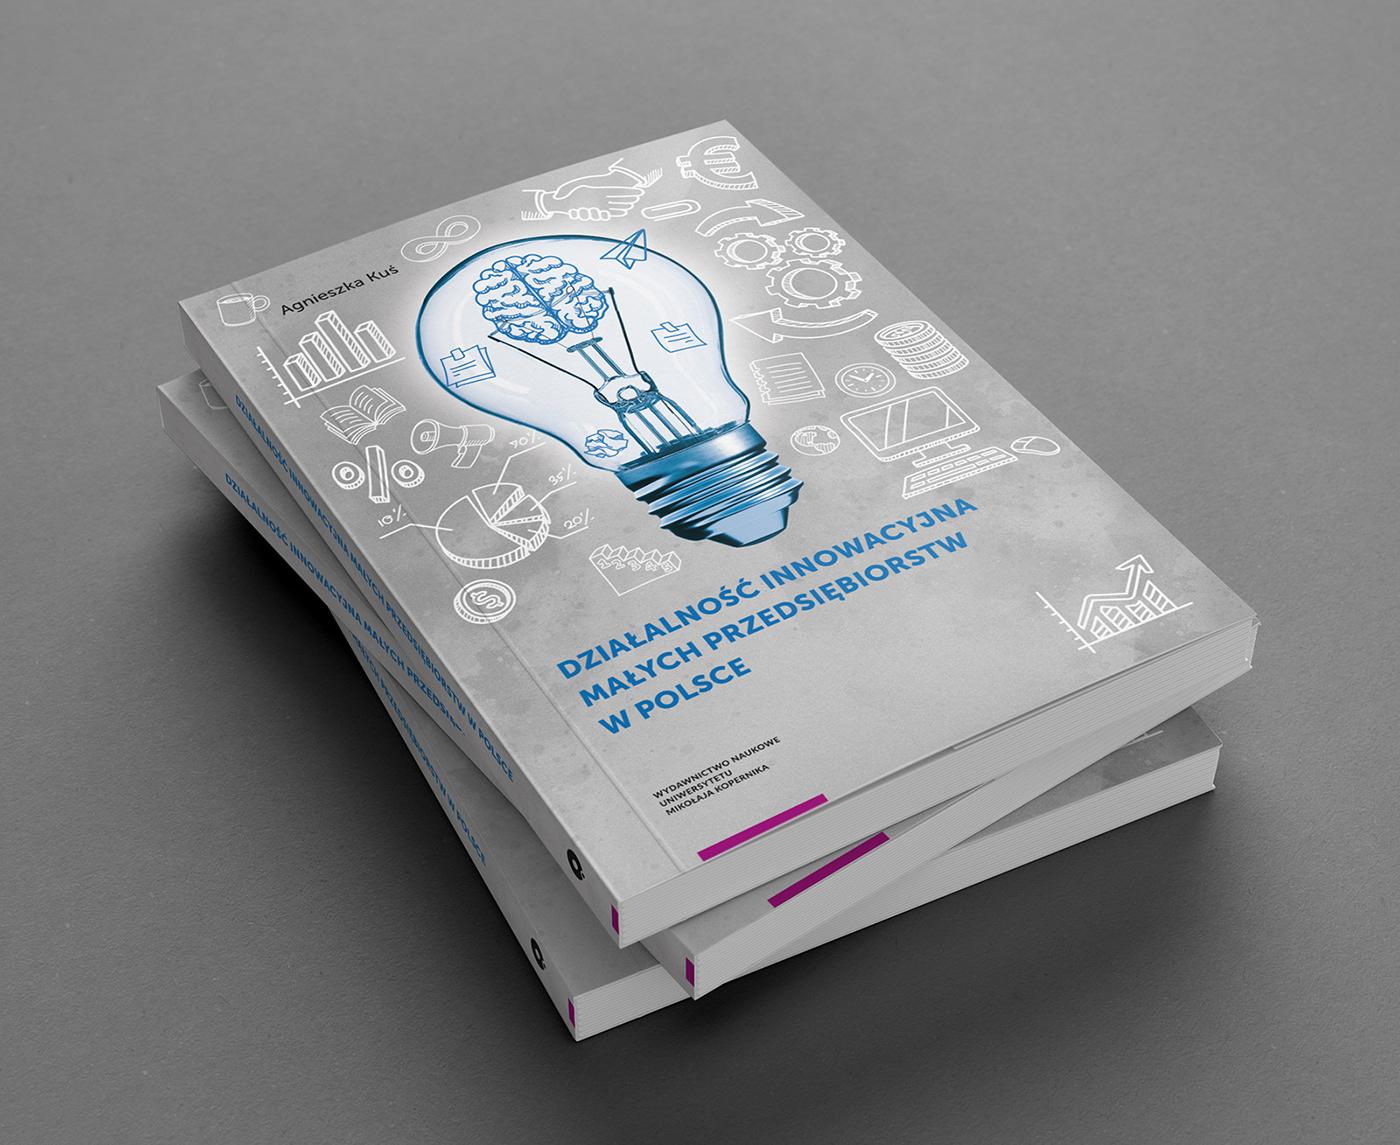 book cover bulb economy książka law management okładka okładka książki pharmacy piggybank